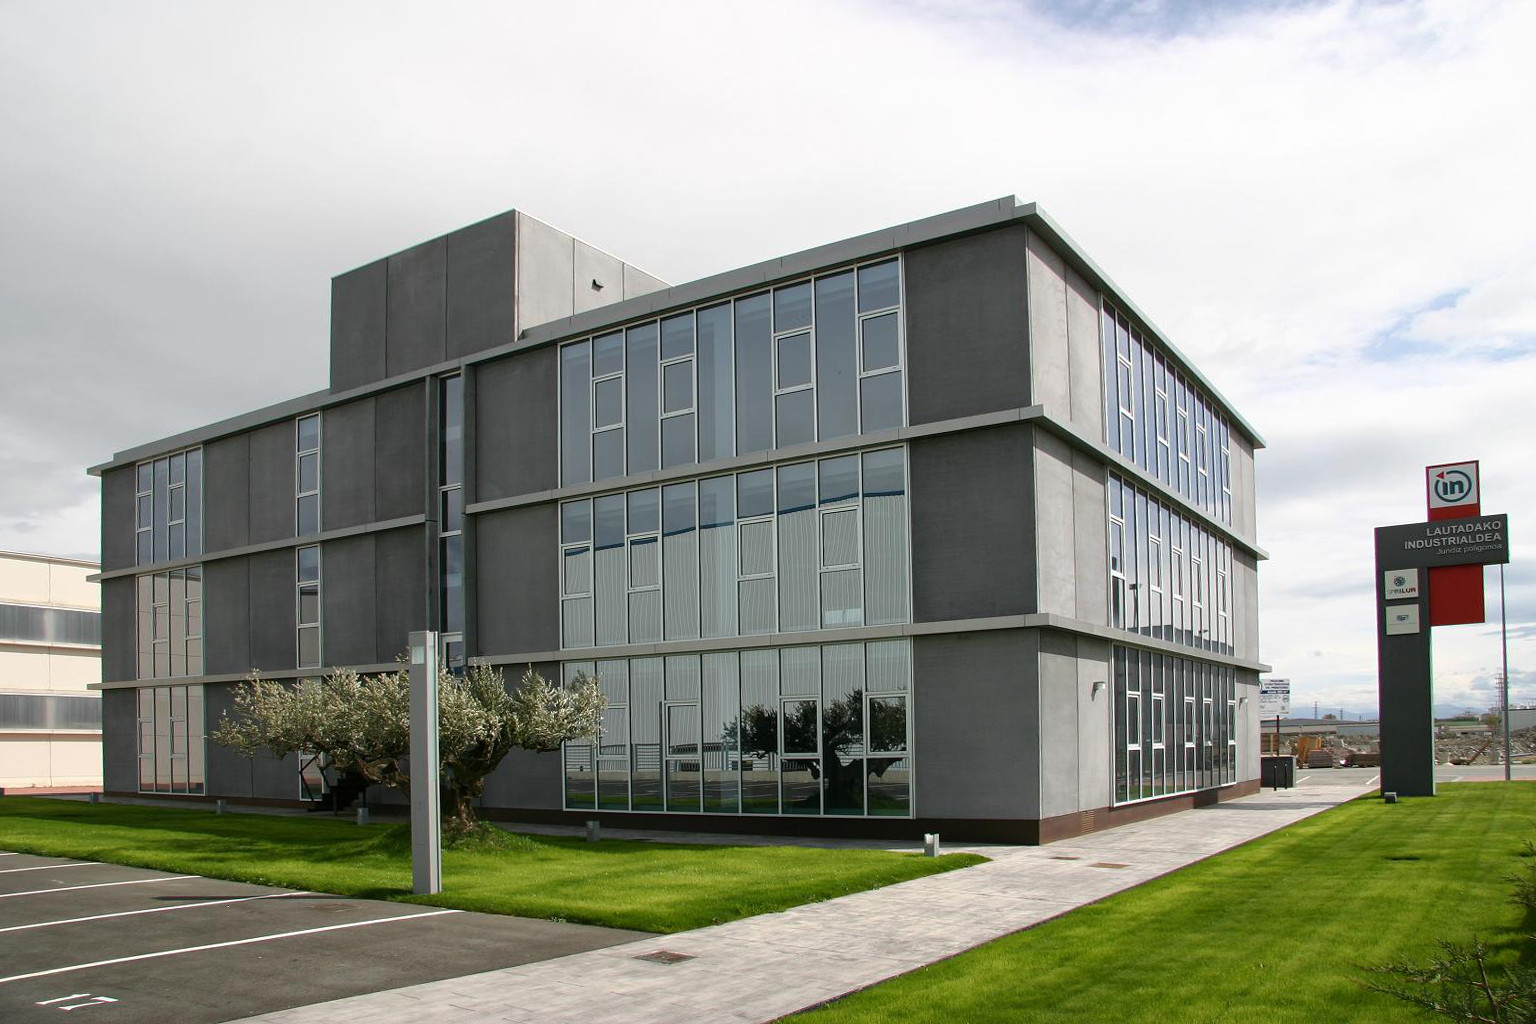 Edificio de oficinas lautadako patxi cortazar for Arquitectura de oficinas